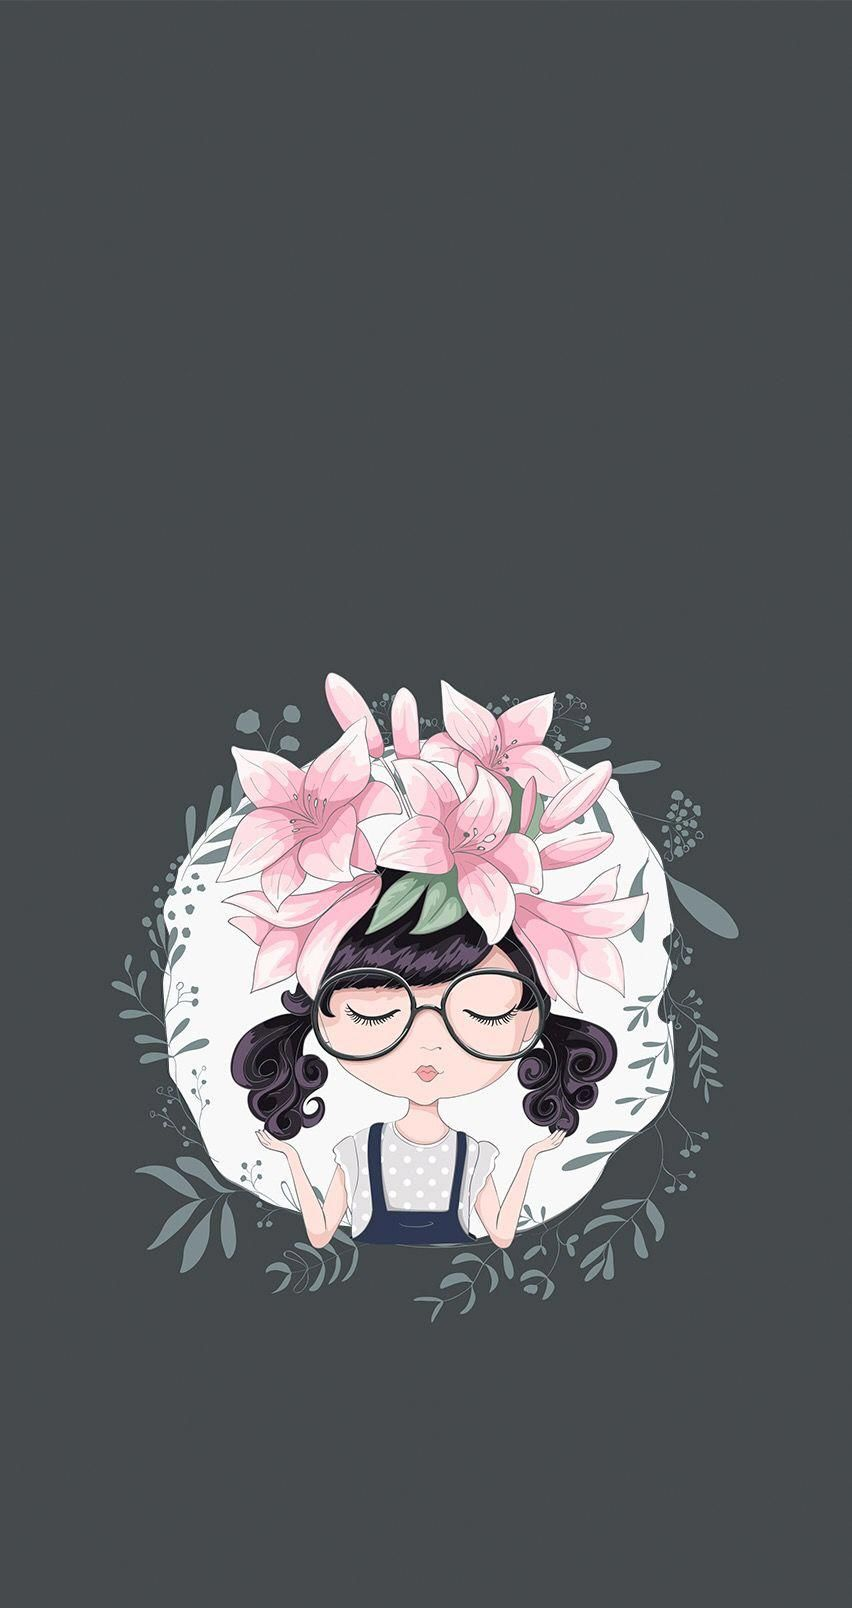 Wallpapers Iphone Flowerswallpaperiphone Wallpaper Iphone Cute Cartoon Wallpaper Iphone Anime Wallpaper Iphone